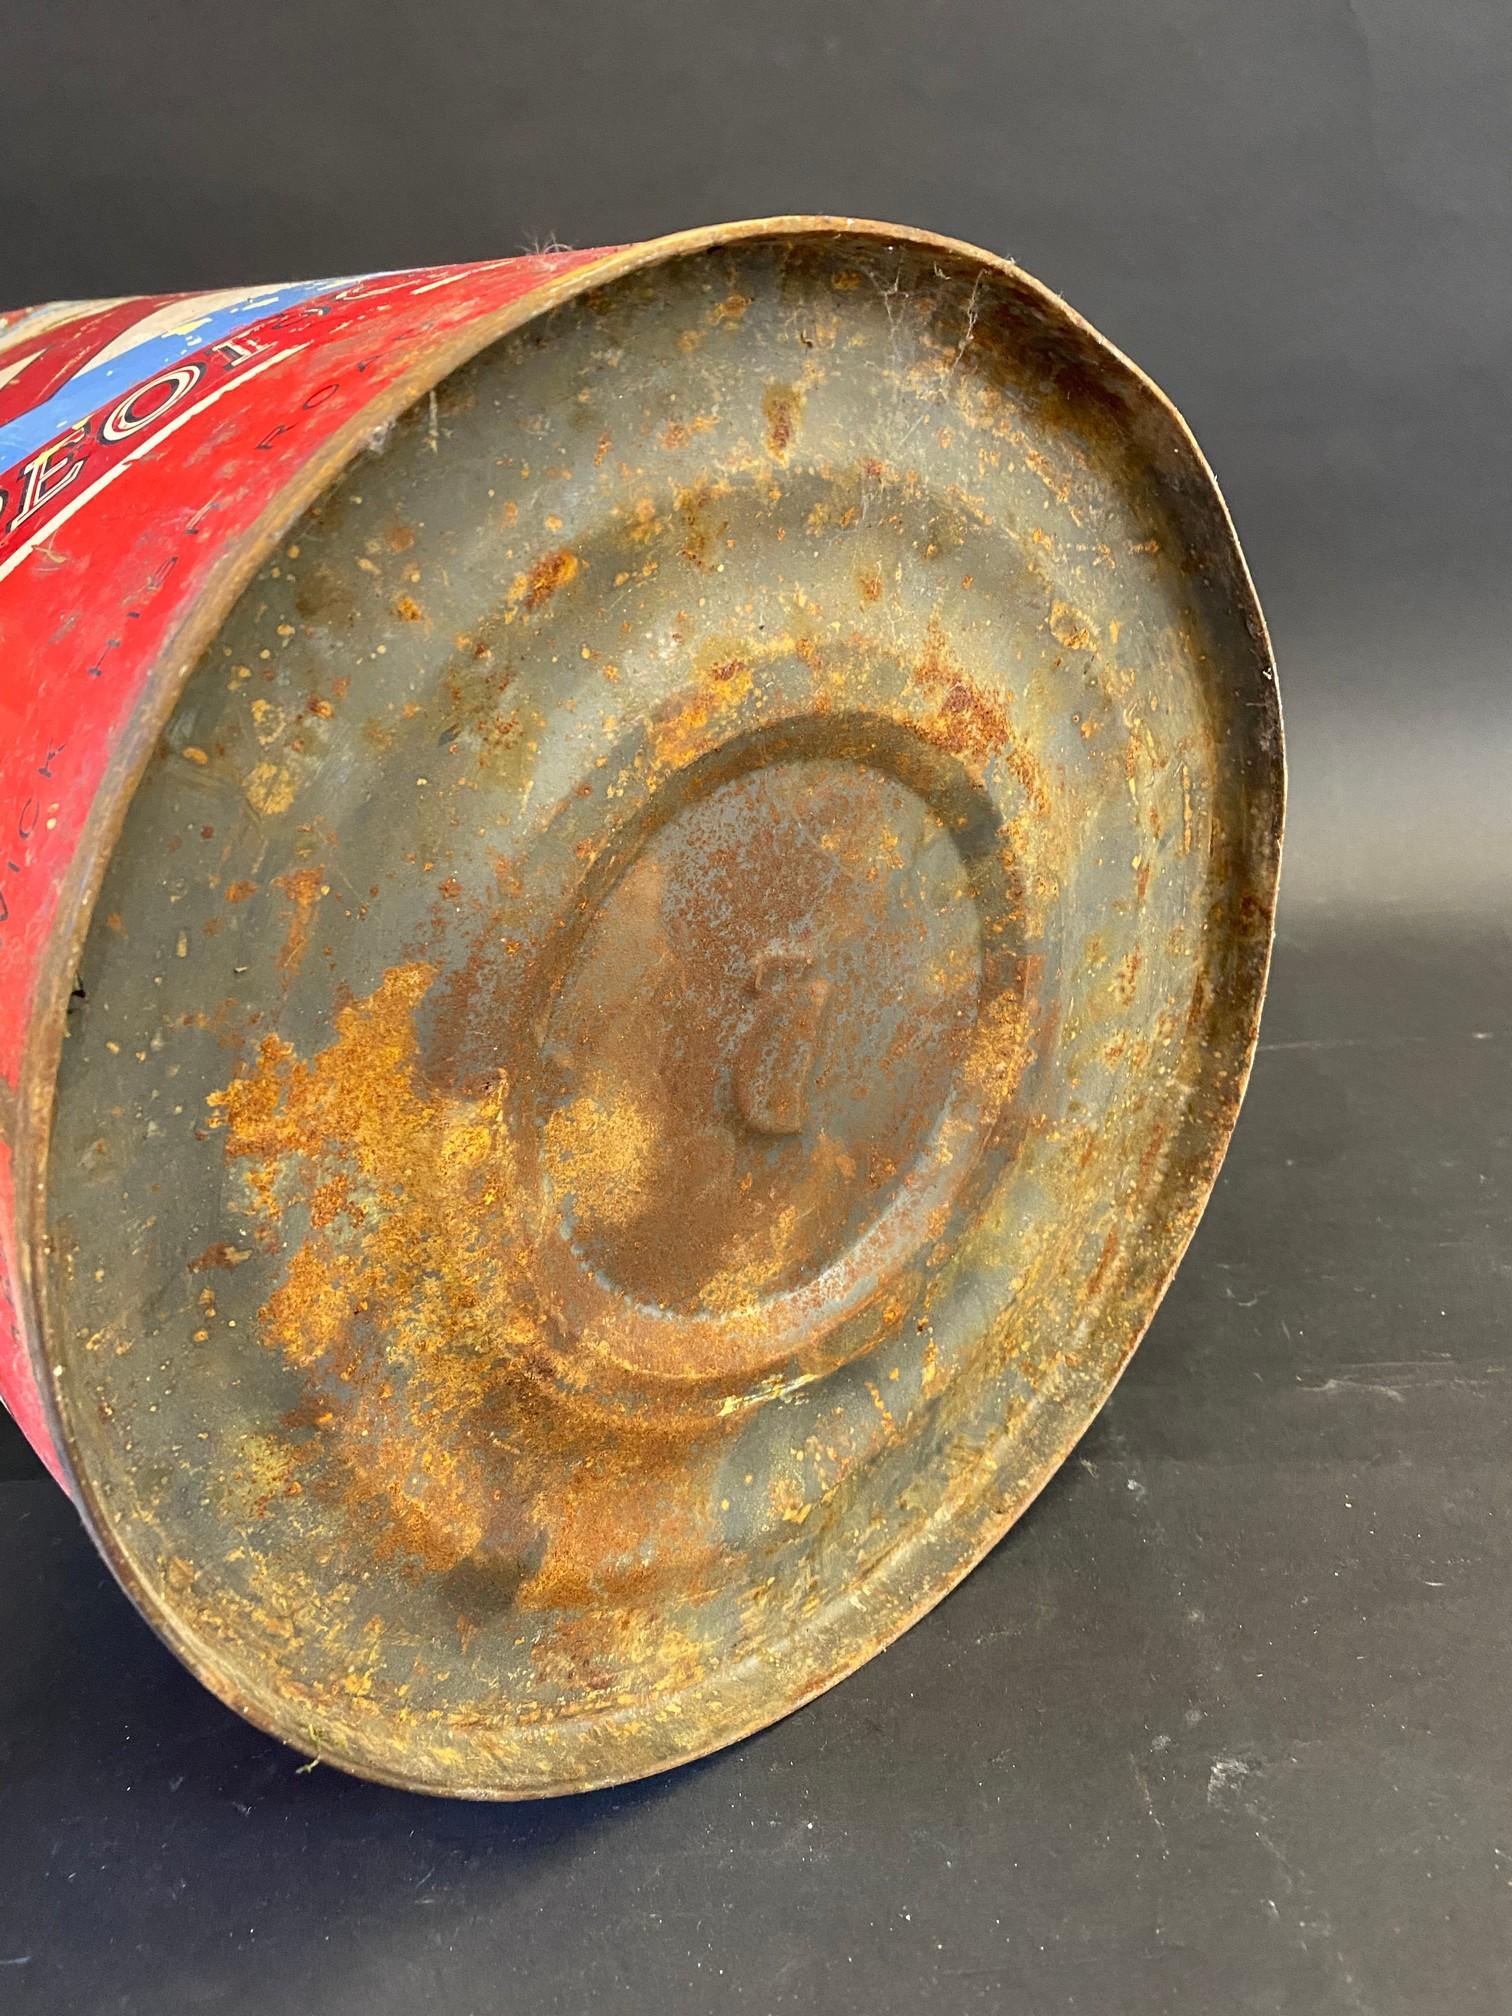 An unusual Redex five gallon drum for 'Redex Diesel Deodorant'. - Image 4 of 4